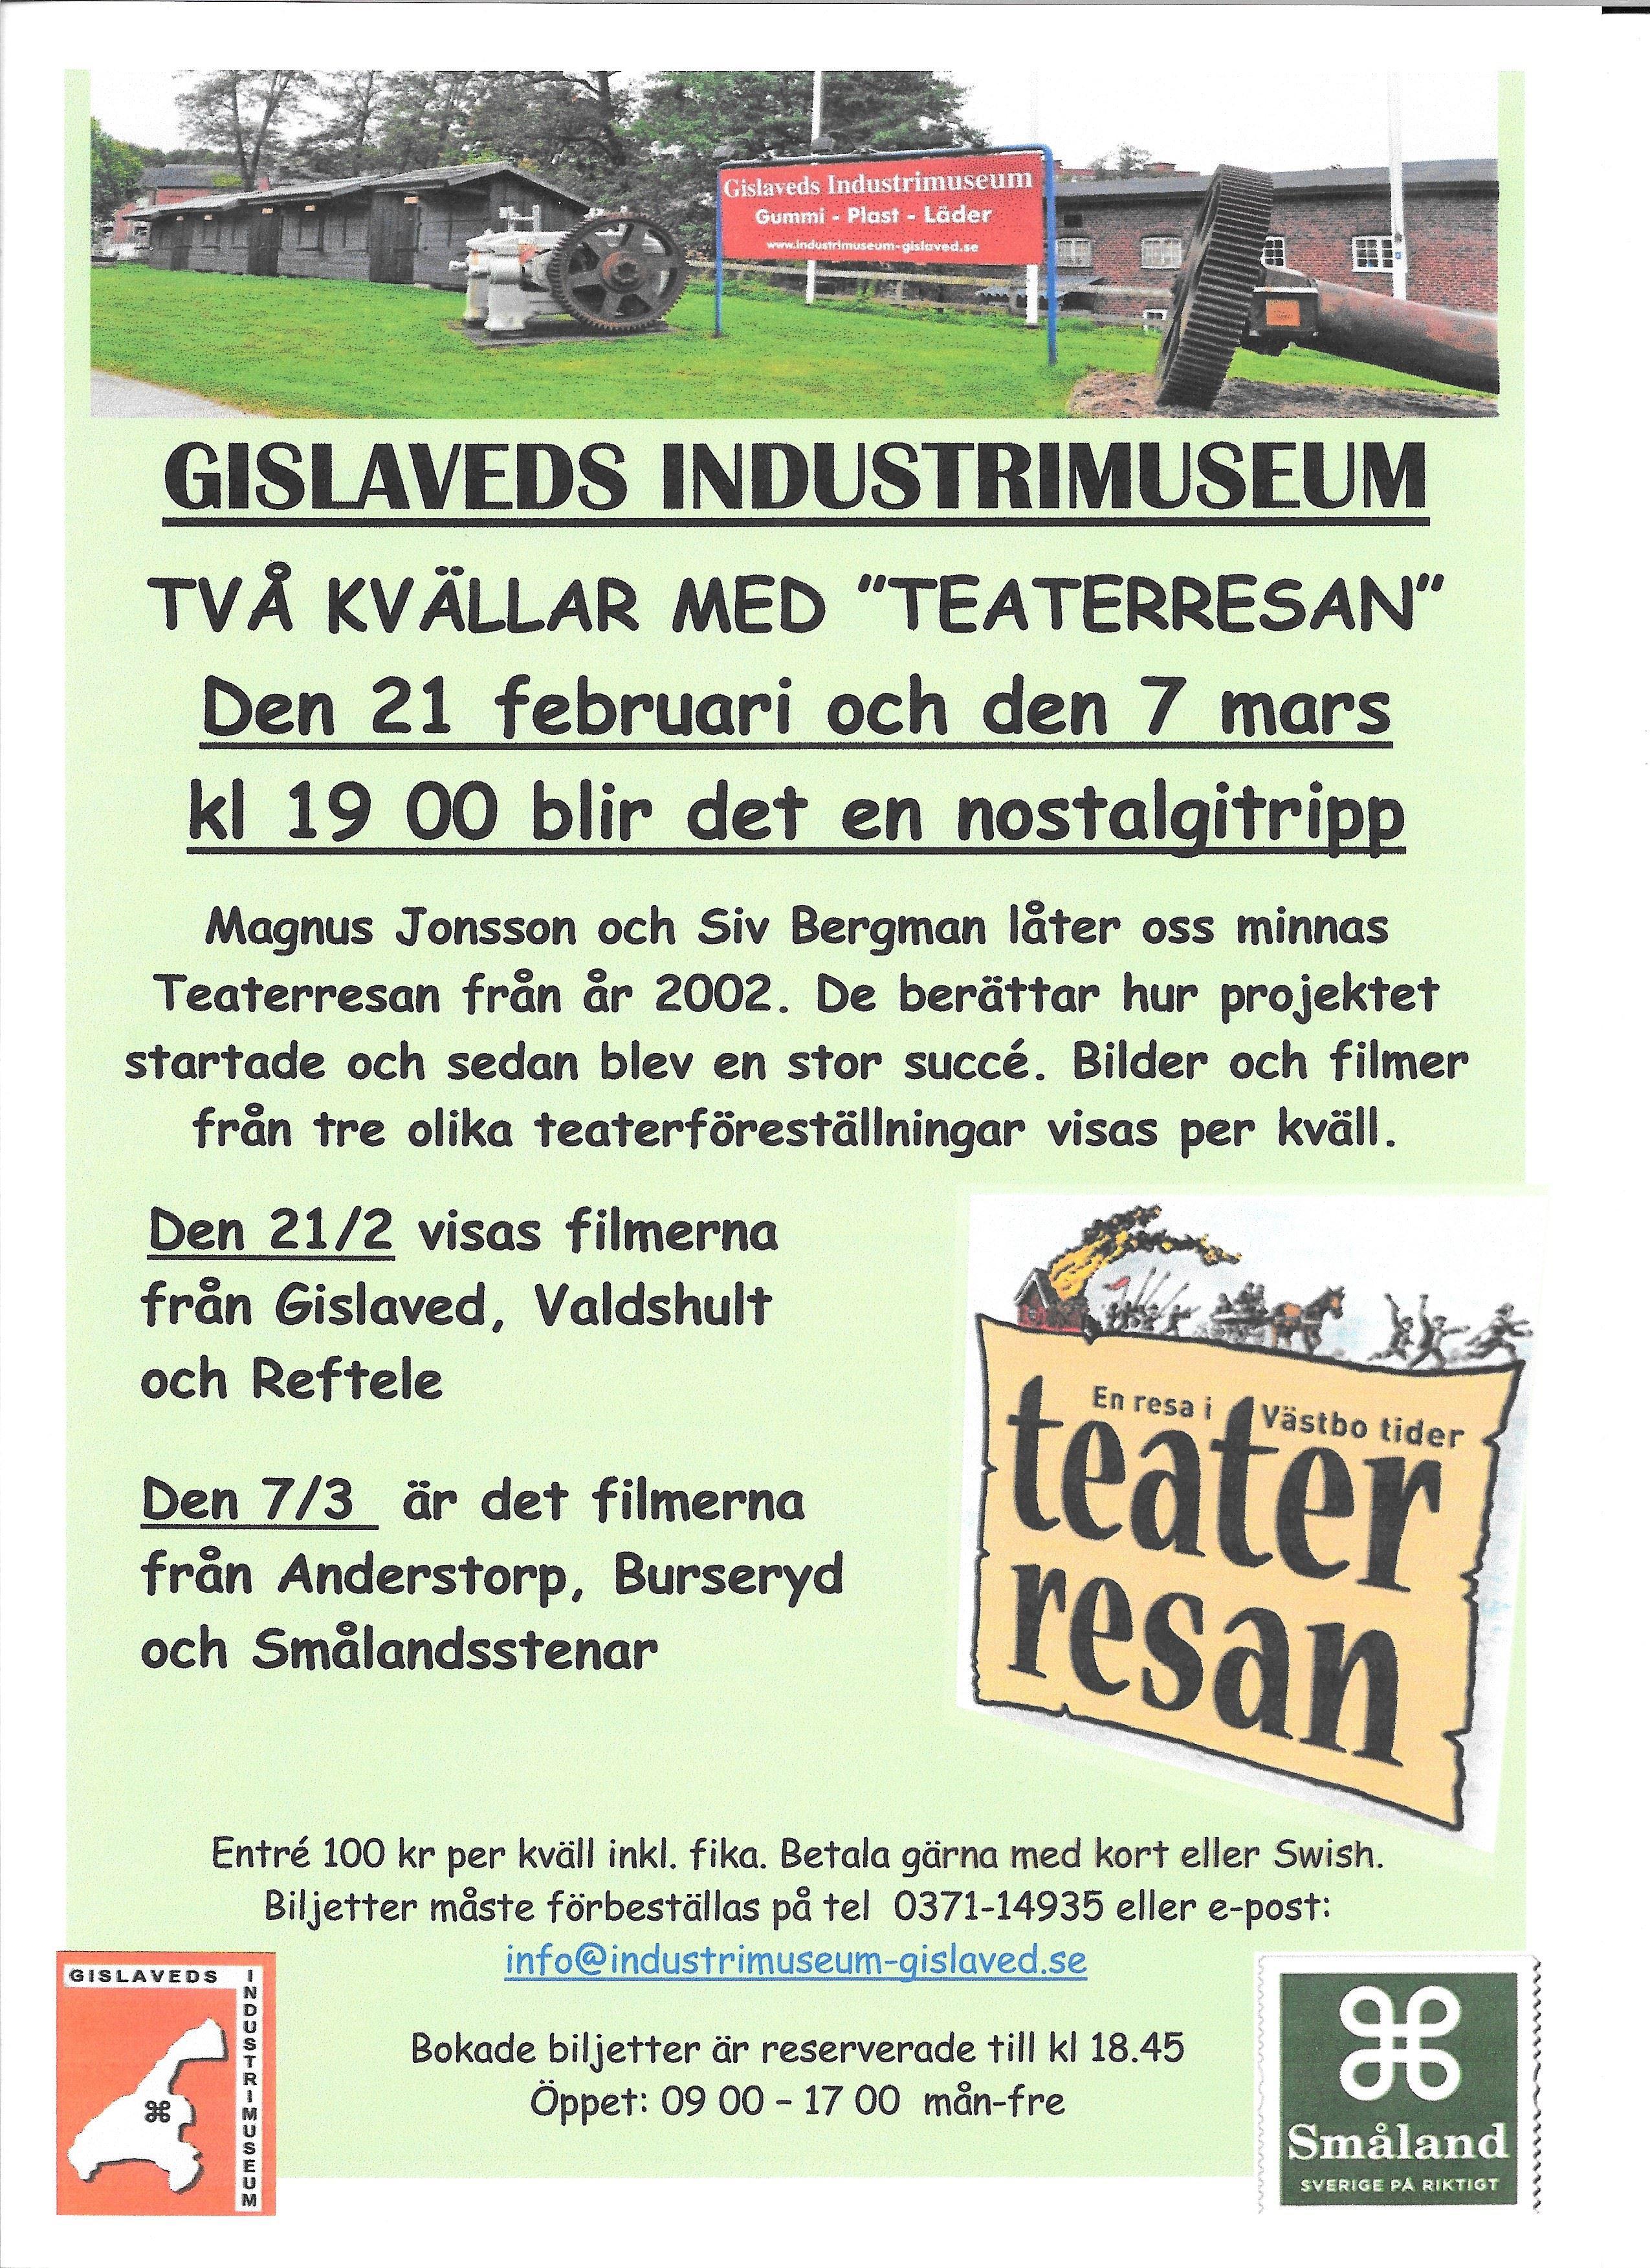 Gislaveds Industrimuseum